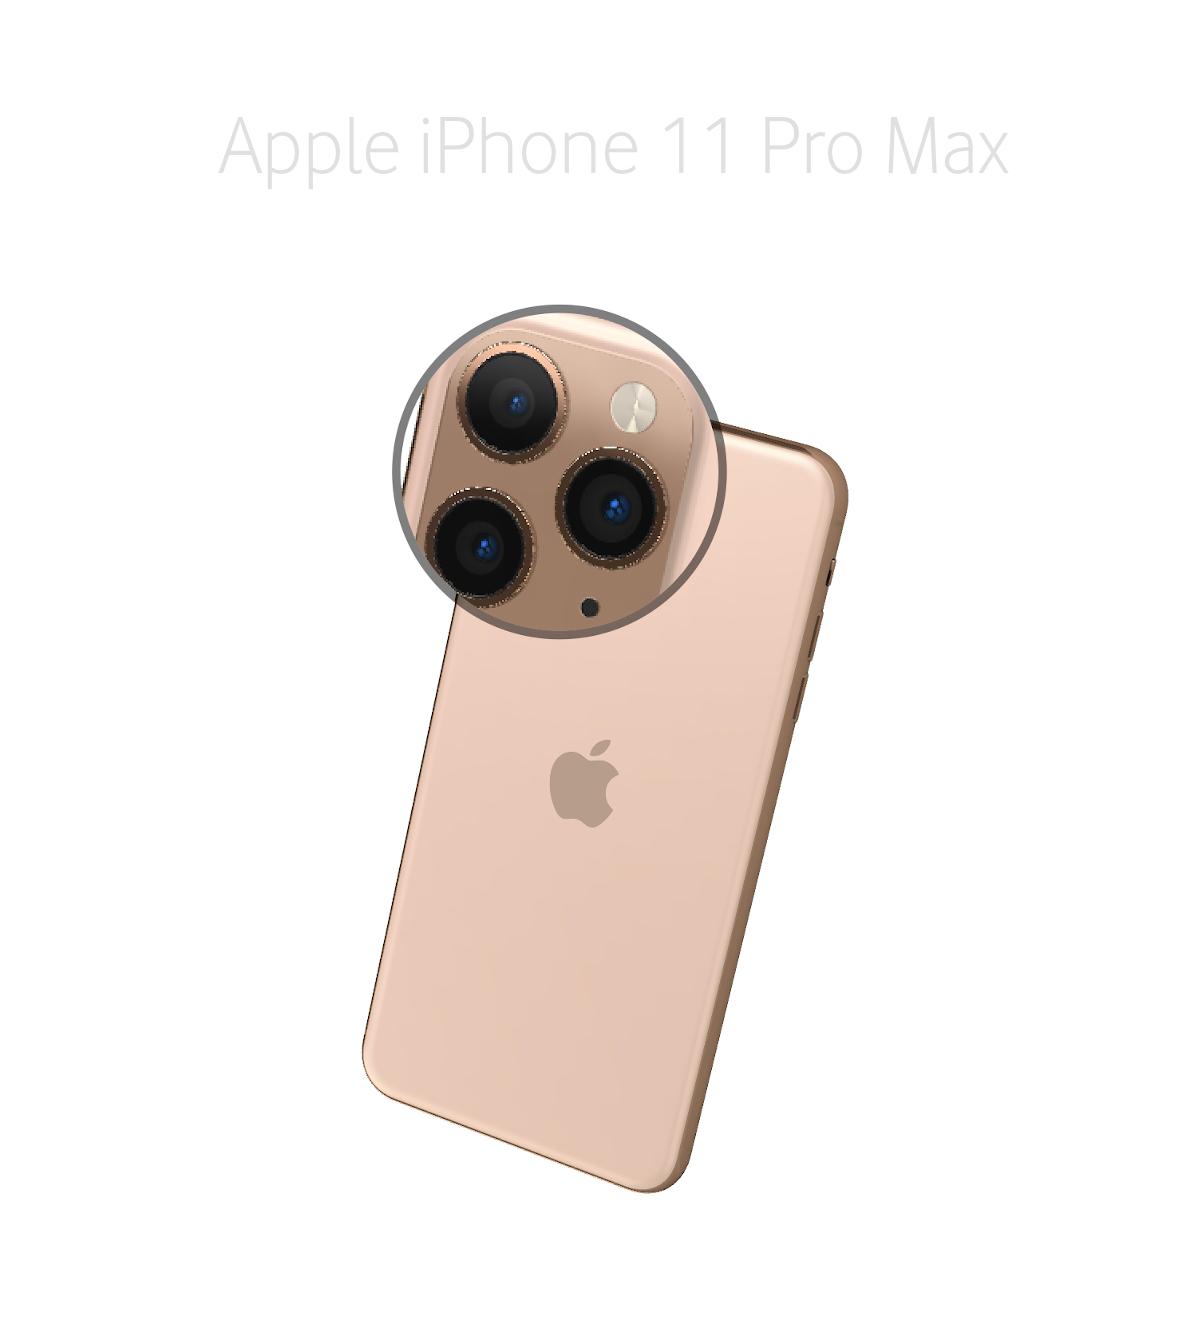 Laga mikrofon Kamera iPhone 11 Pro Max